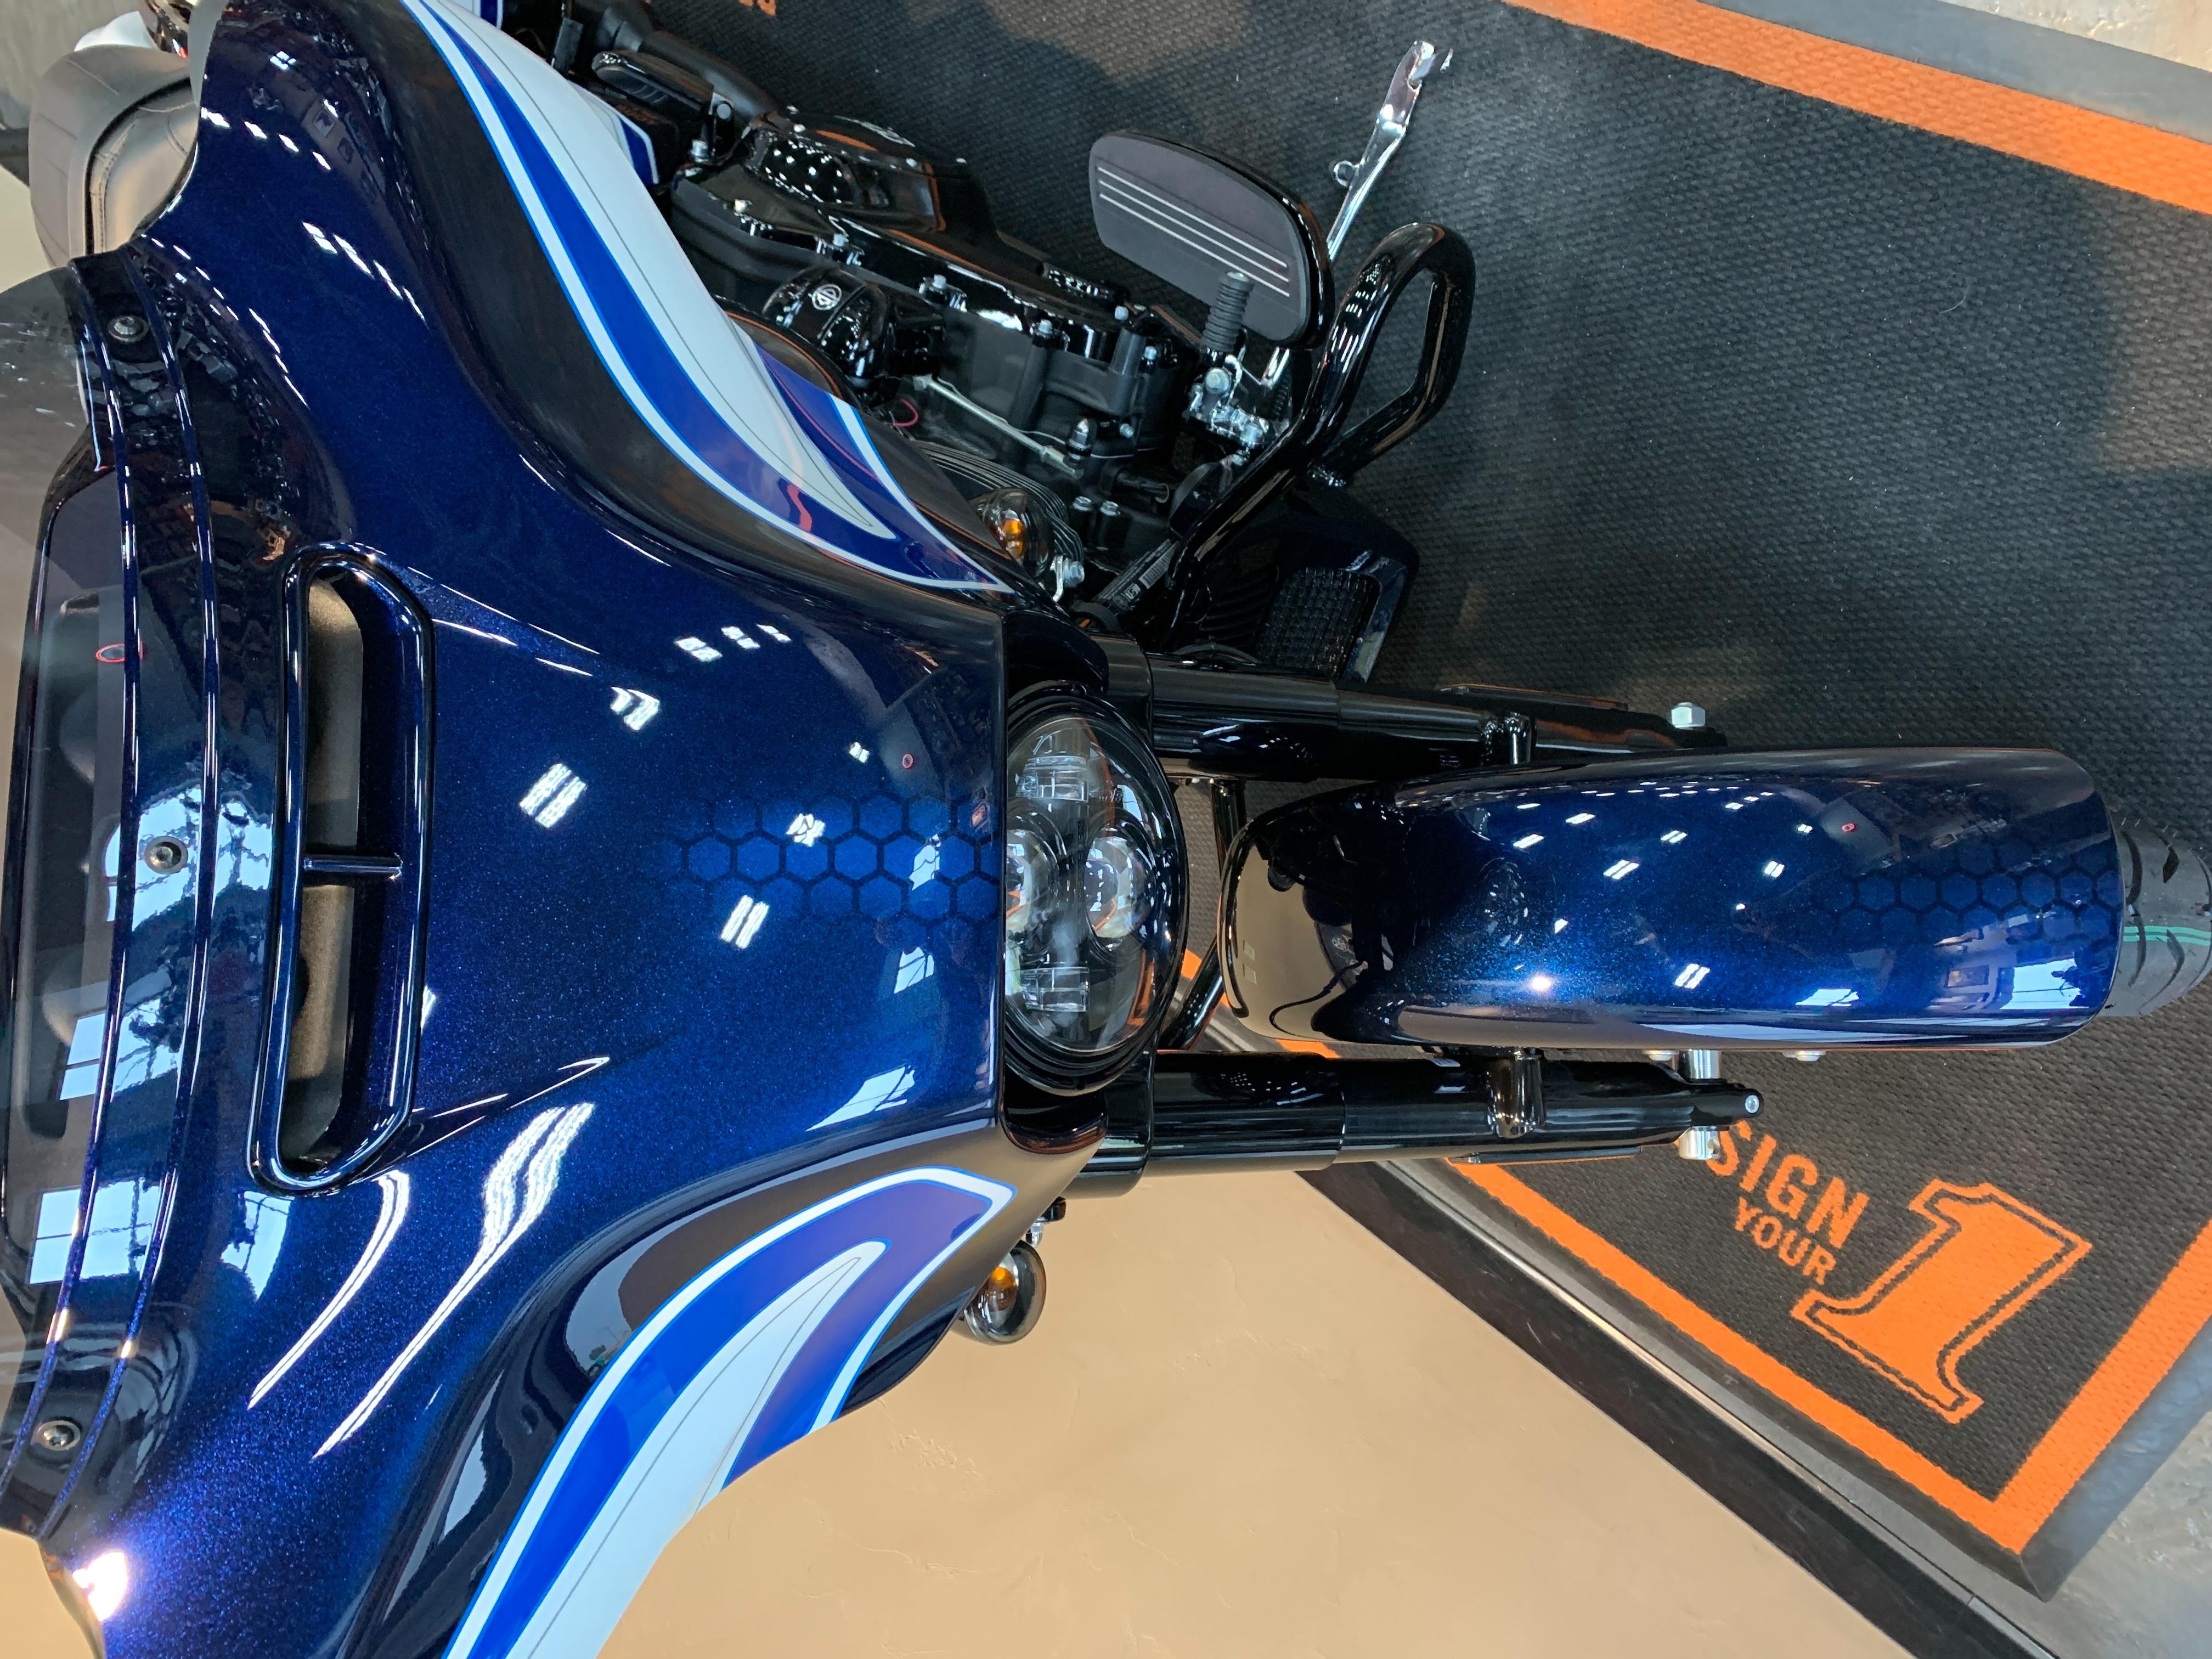 2021 Harley-Davidson Grand American Touring Street Glide Special at Vandervest Harley-Davidson, Green Bay, WI 54303